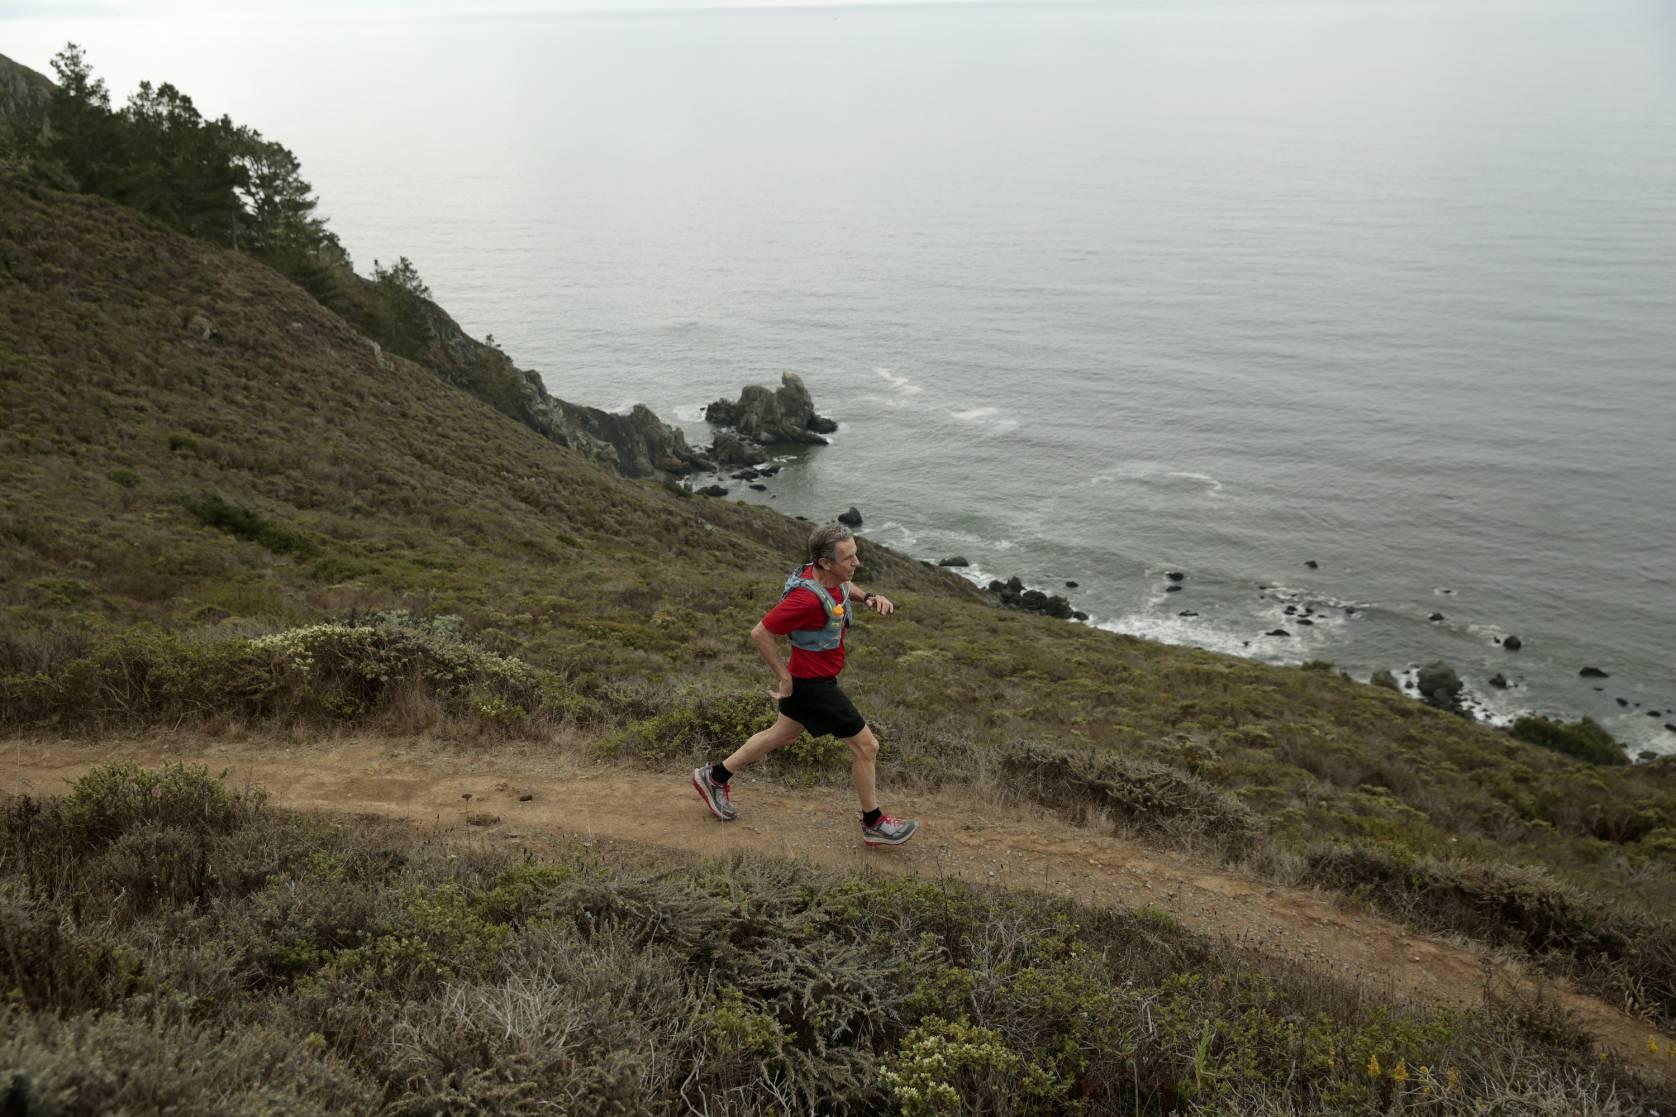 Ultramarathon runner Eric Spector trains on Muir Beach, California